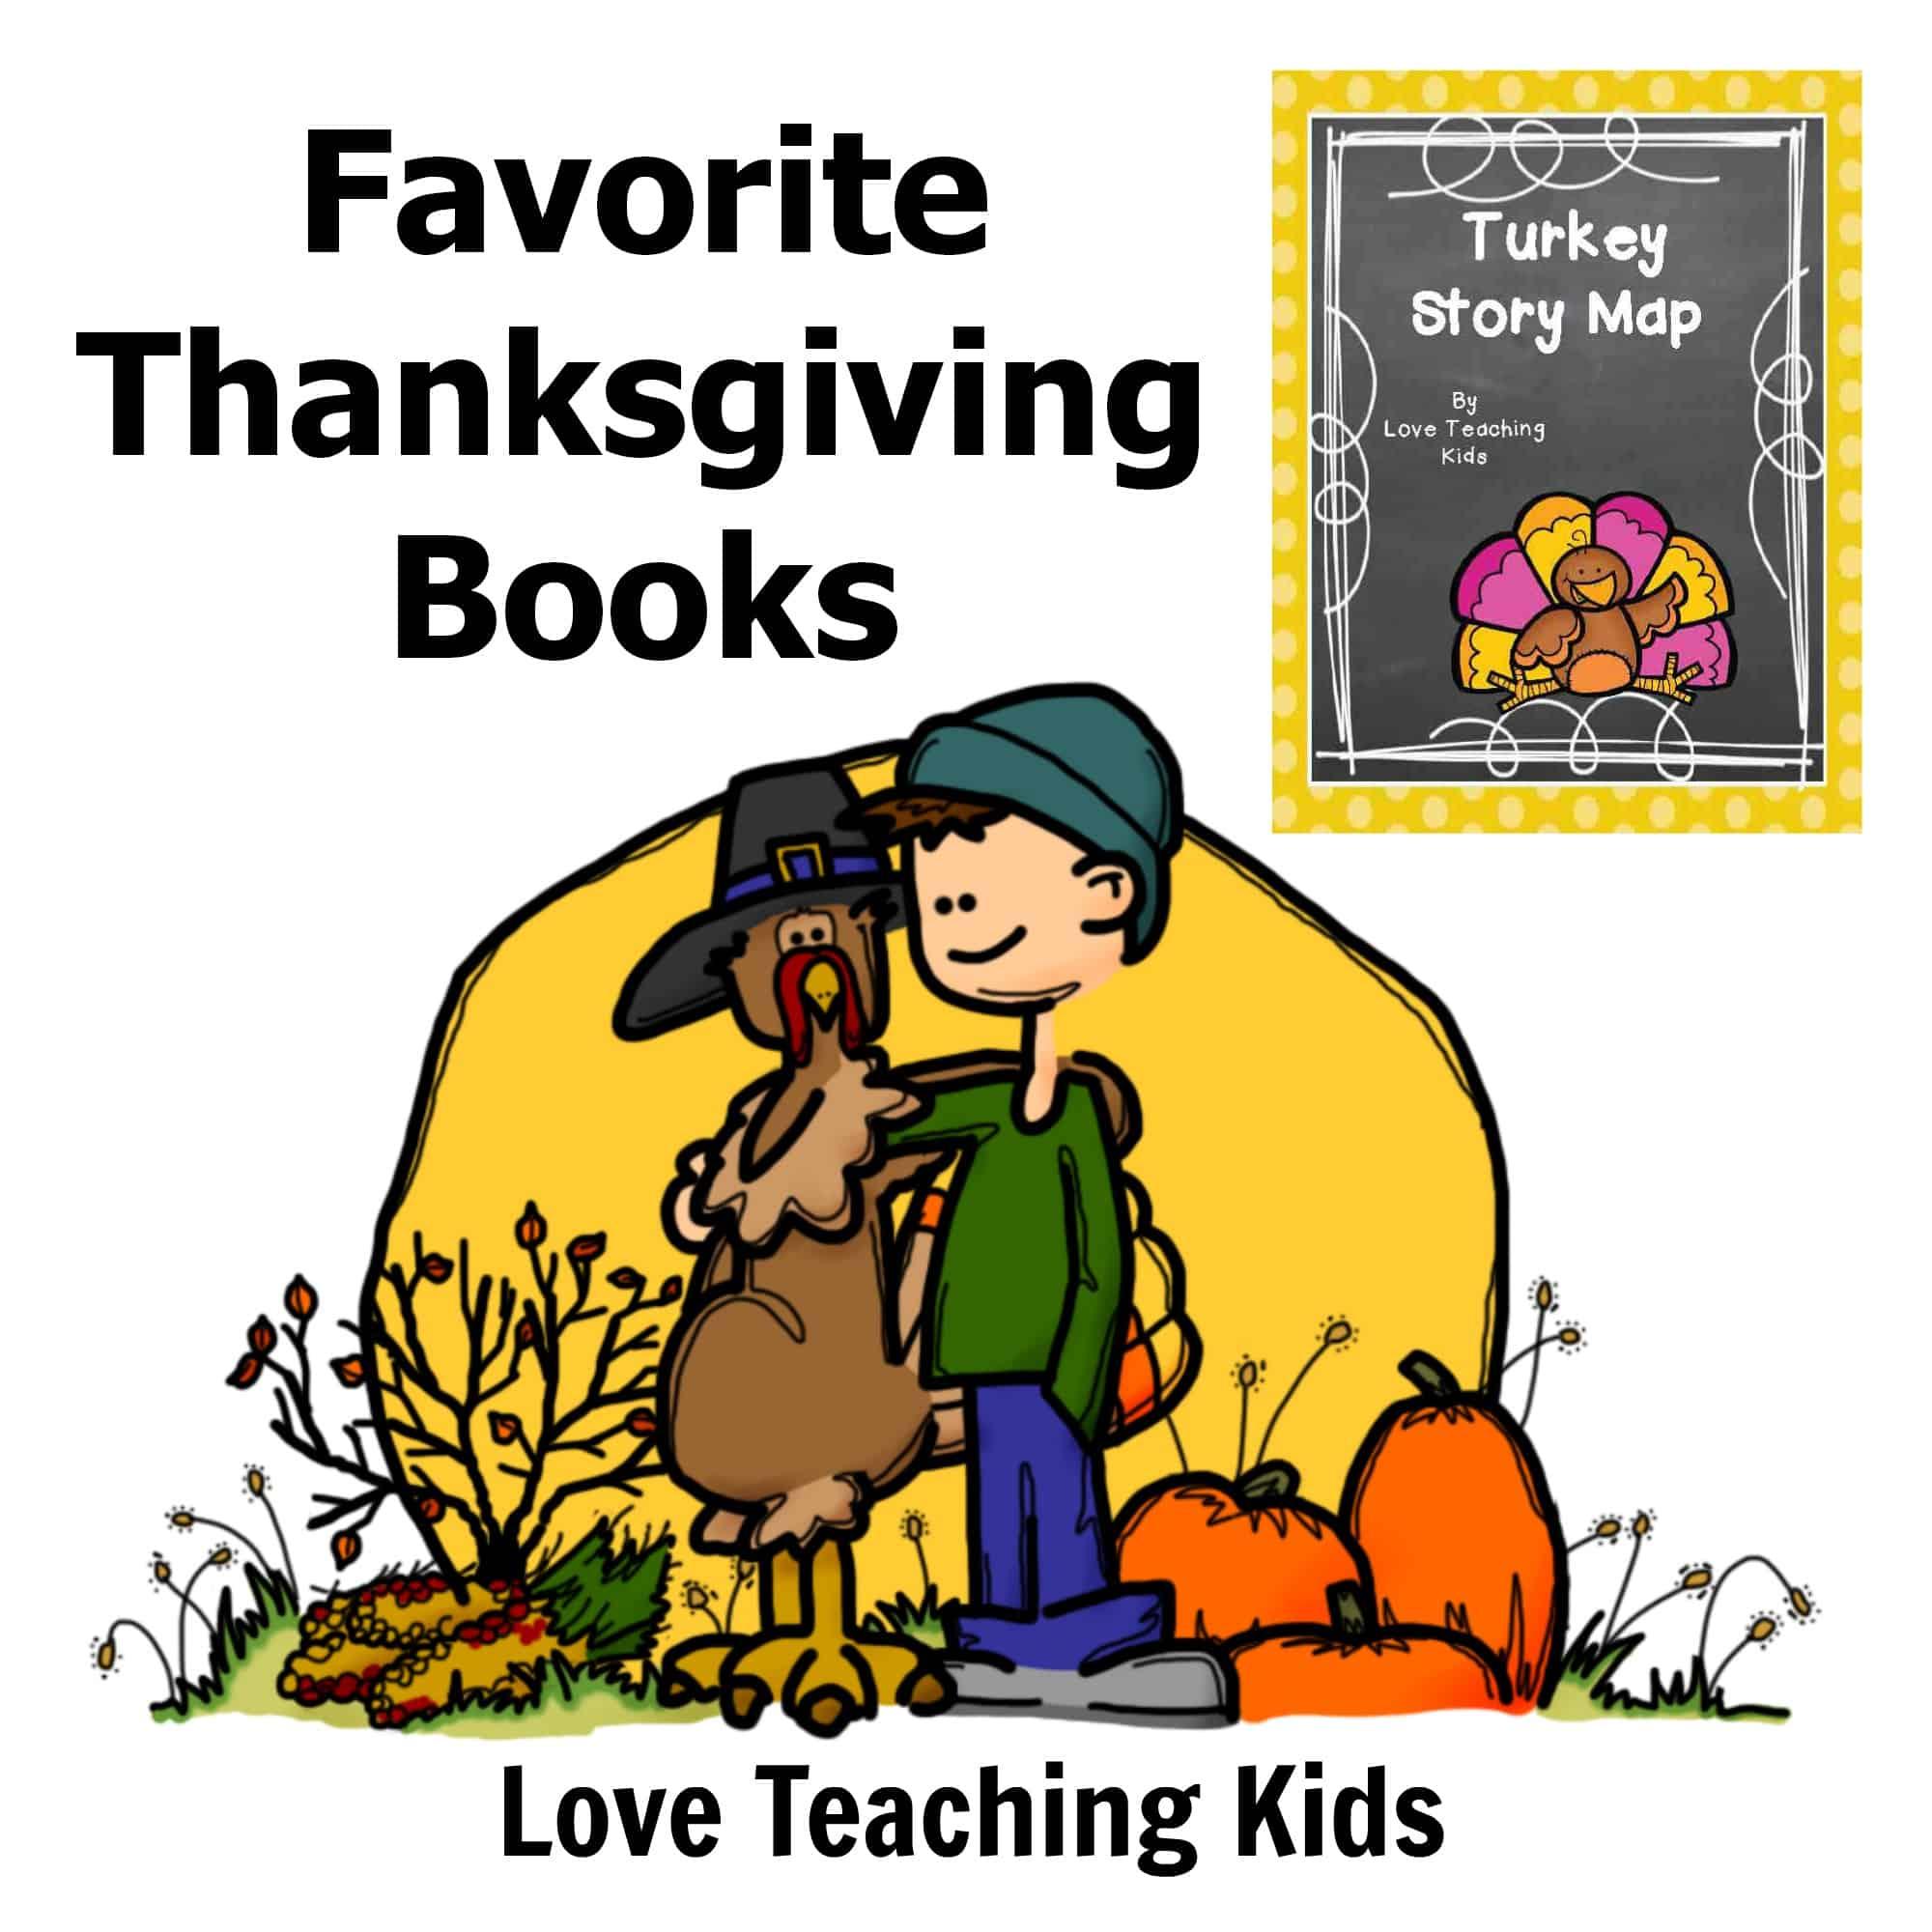 Favorite Thanksgiving Books Love Teaching Kids